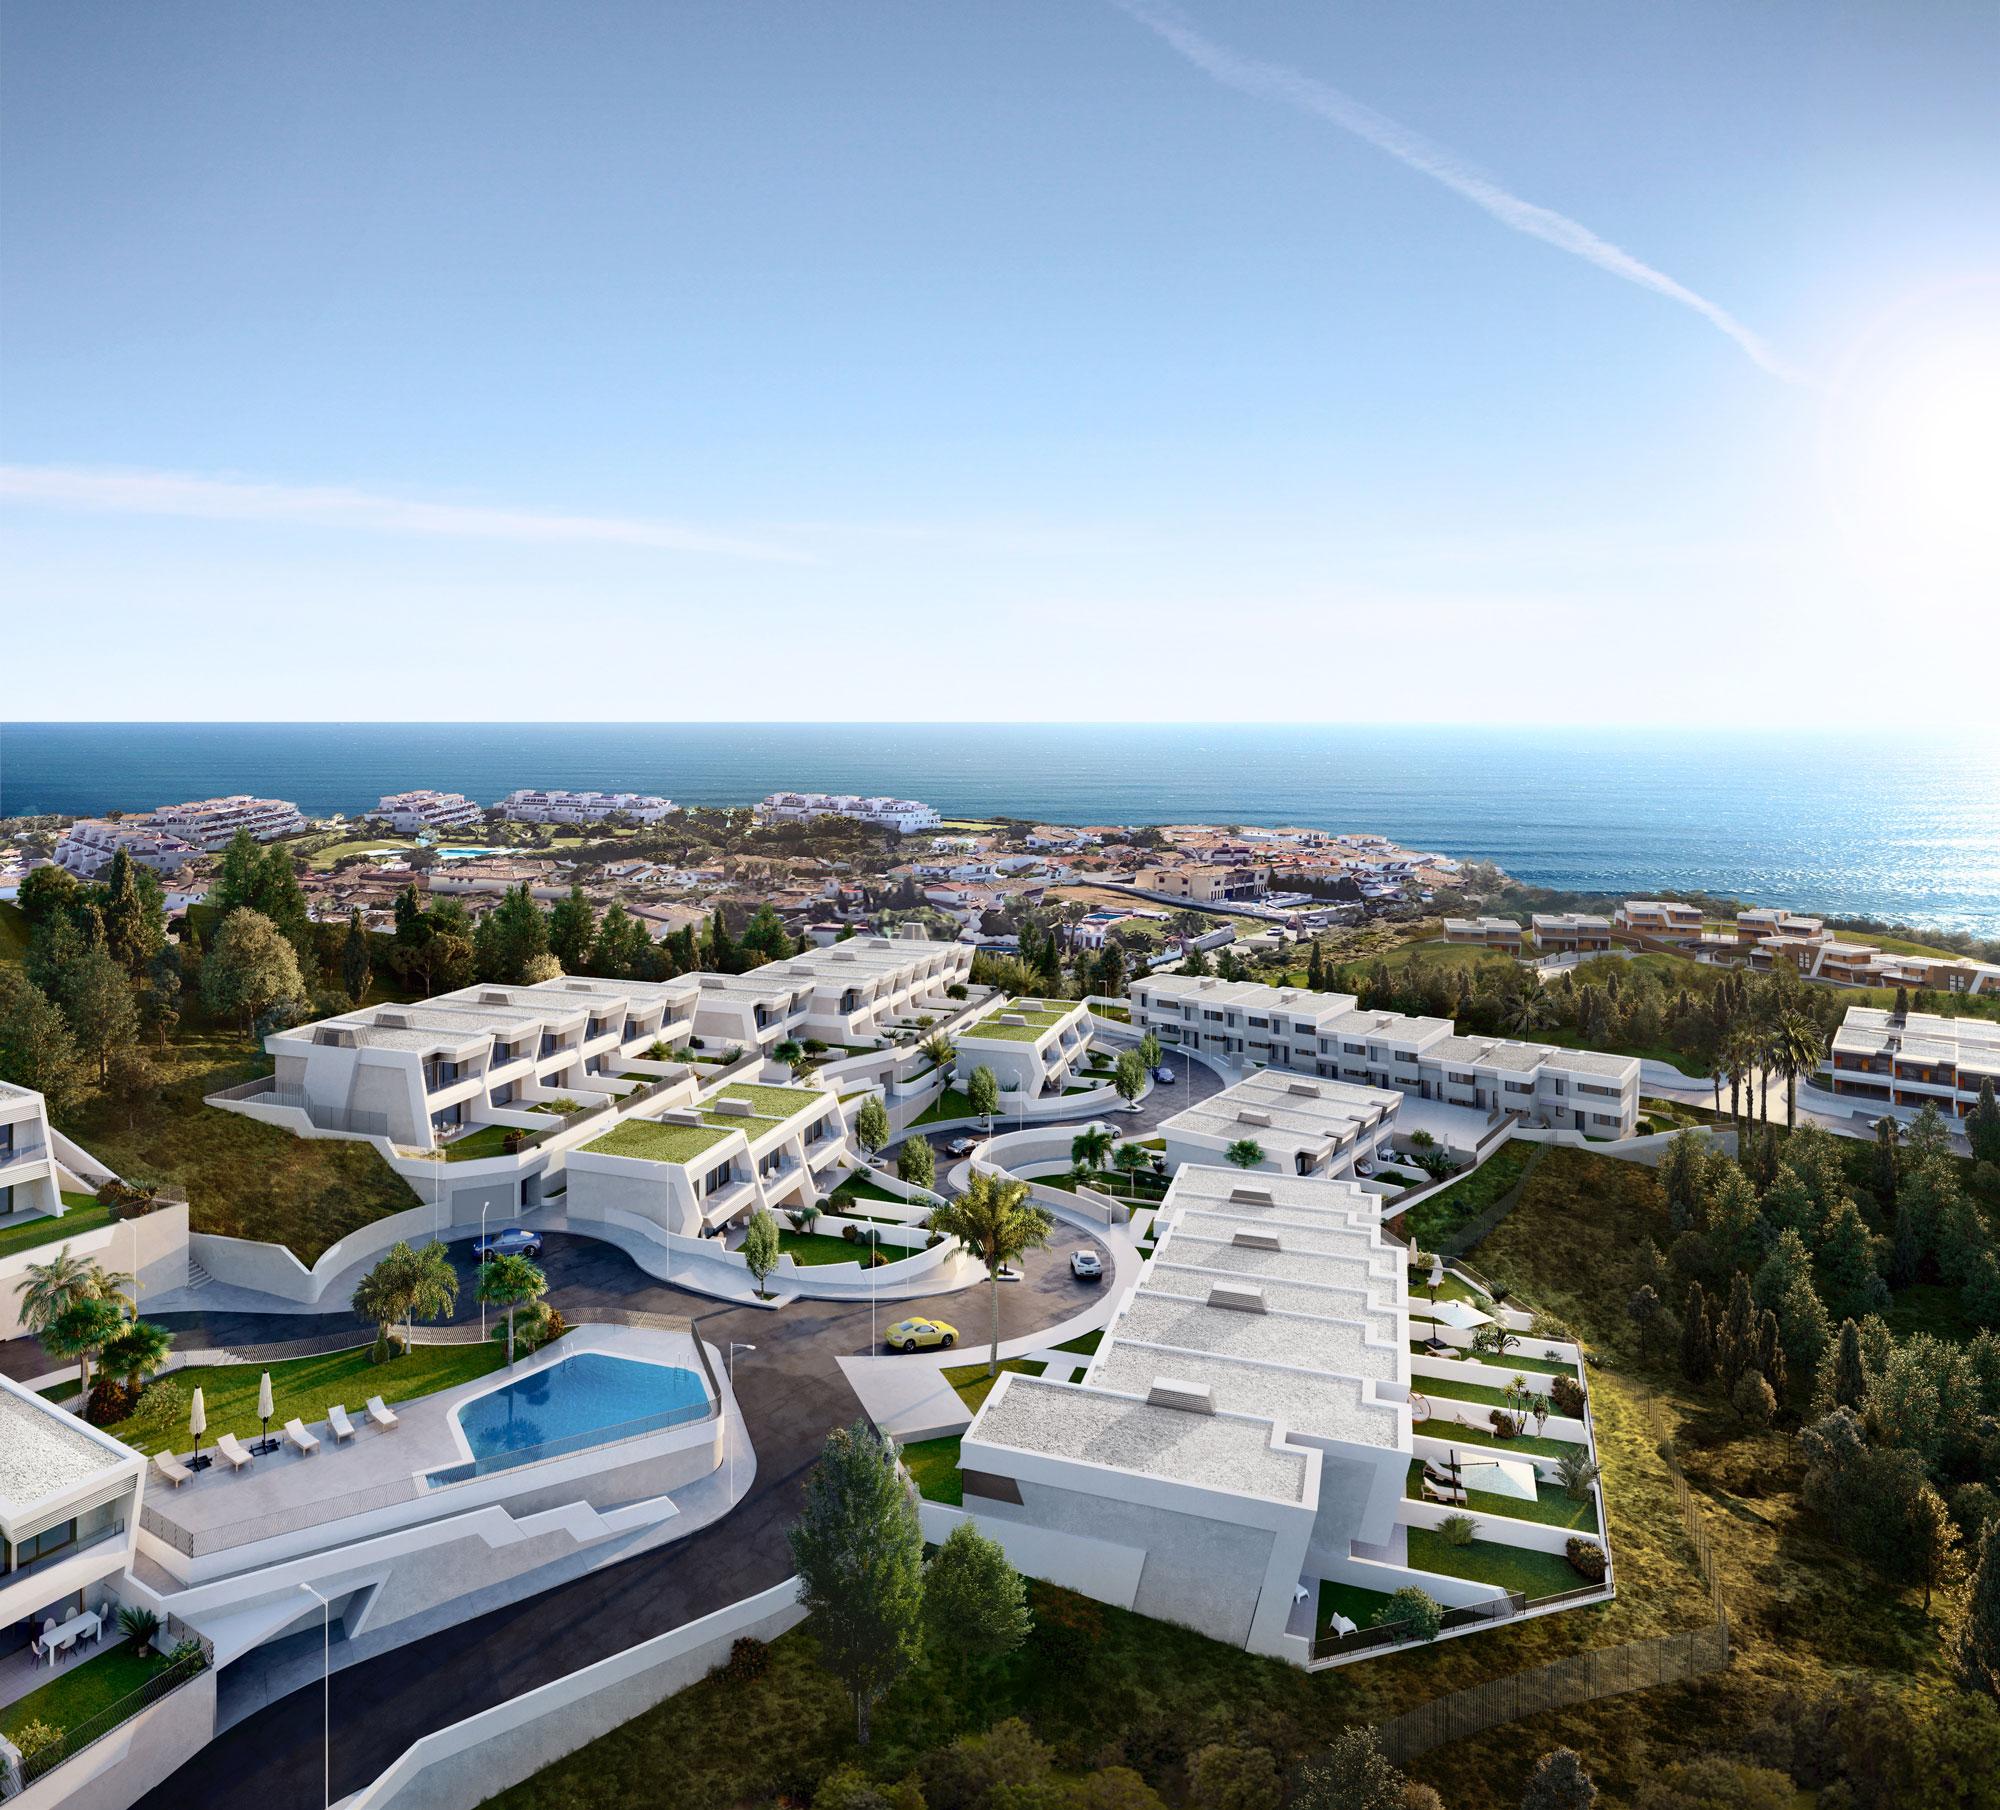 Greenlife-estates-modern-development-La-Cala-de Mijas